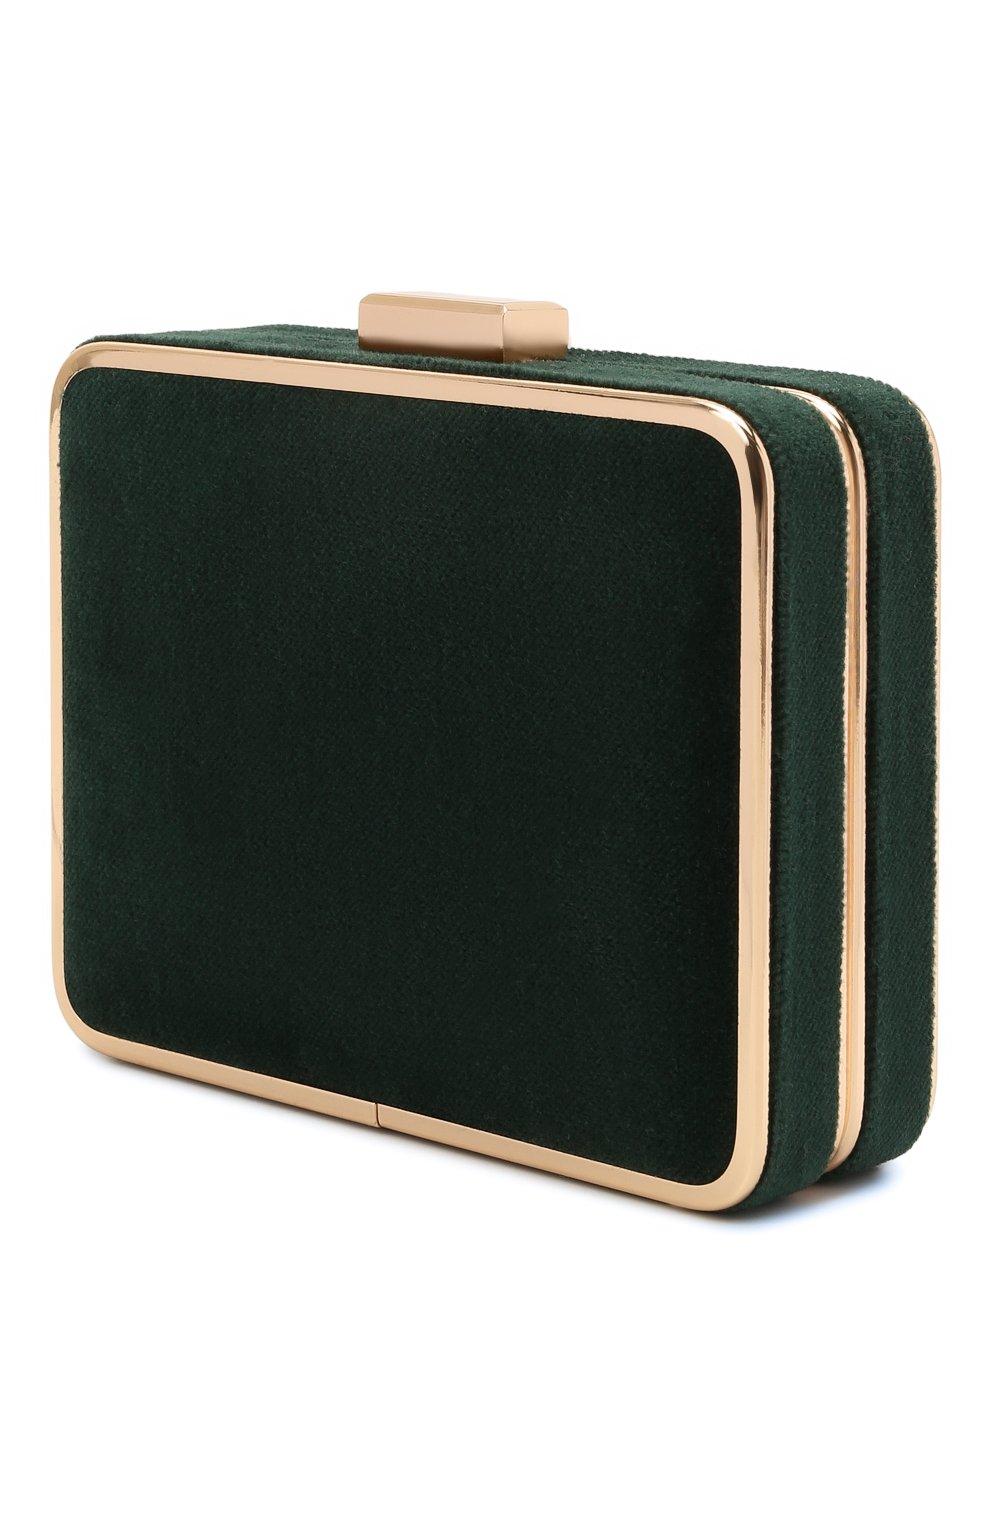 Детская сумка DAVID CHARLES зеленого цвета, арт. 7601 | Фото 2 (Материал: Текстиль)